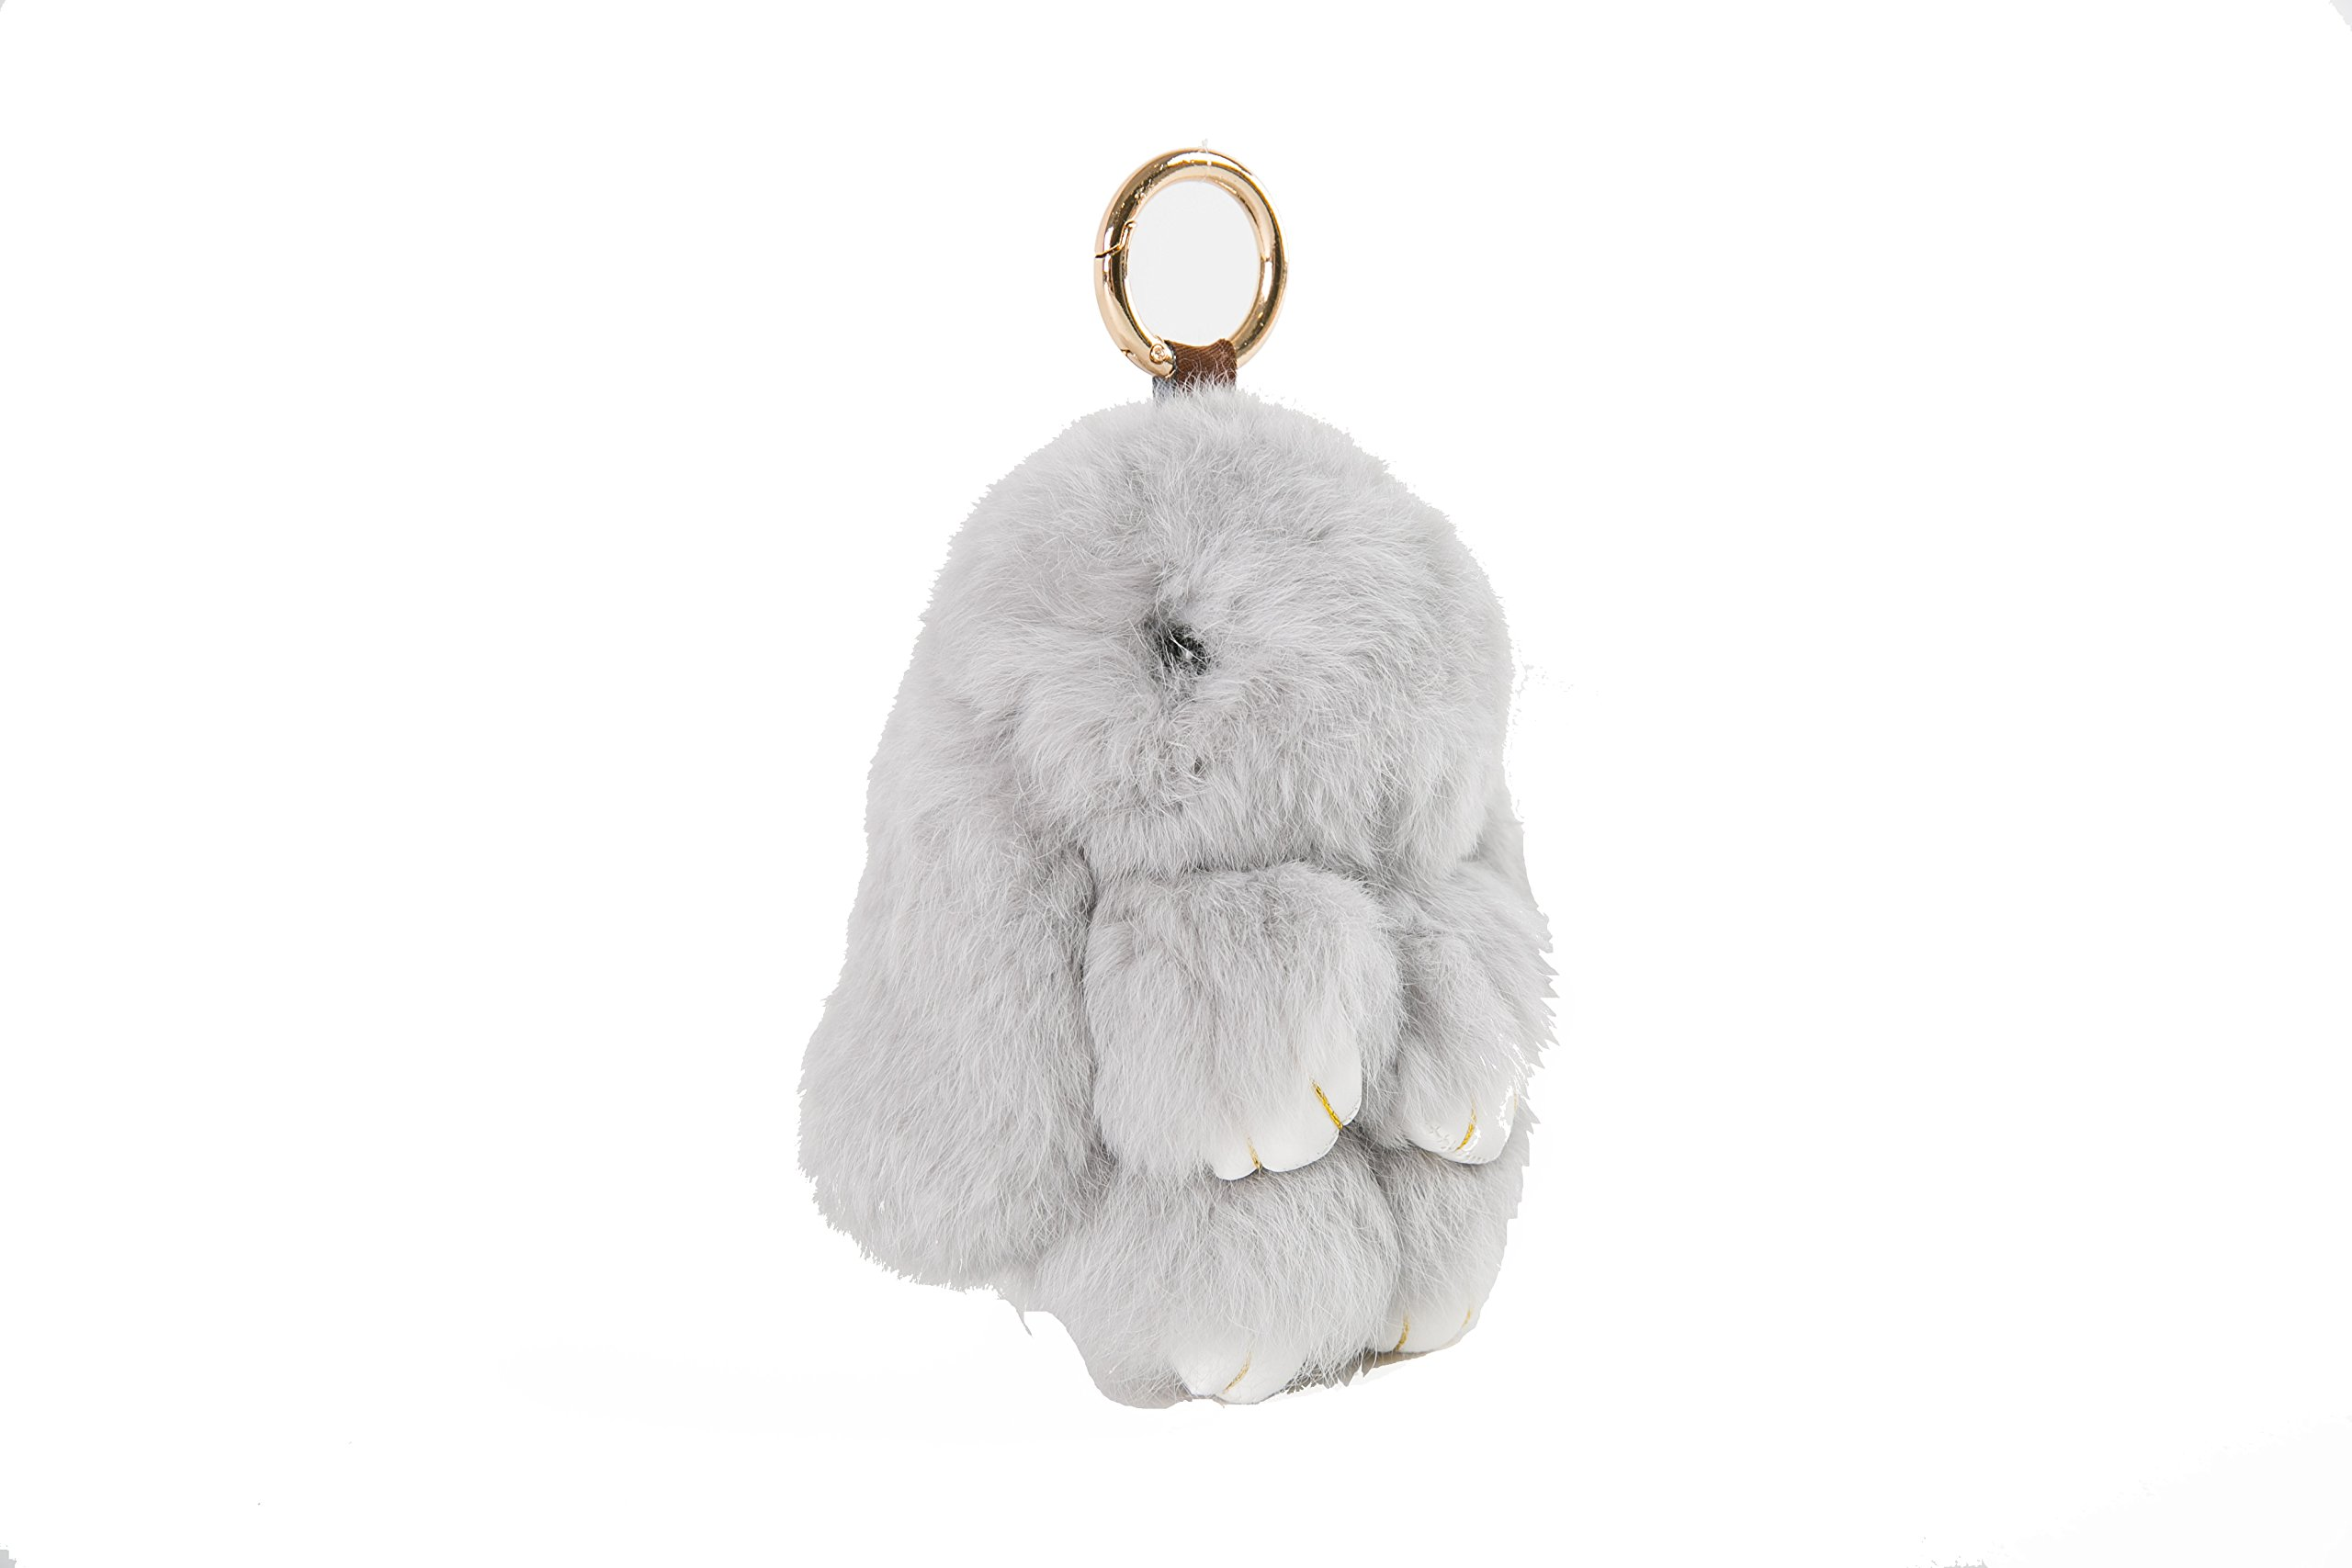 YISEVEN Stuffed Bunny Keychain Toy - Soft and Fuzzy Large Stitch Plush Rabbit Fur Key Chain - Cute Fluffy Bunnies Floppy Furry Animal Doll Gift for Girl Women Purse Bag Car Charm - Light Gray